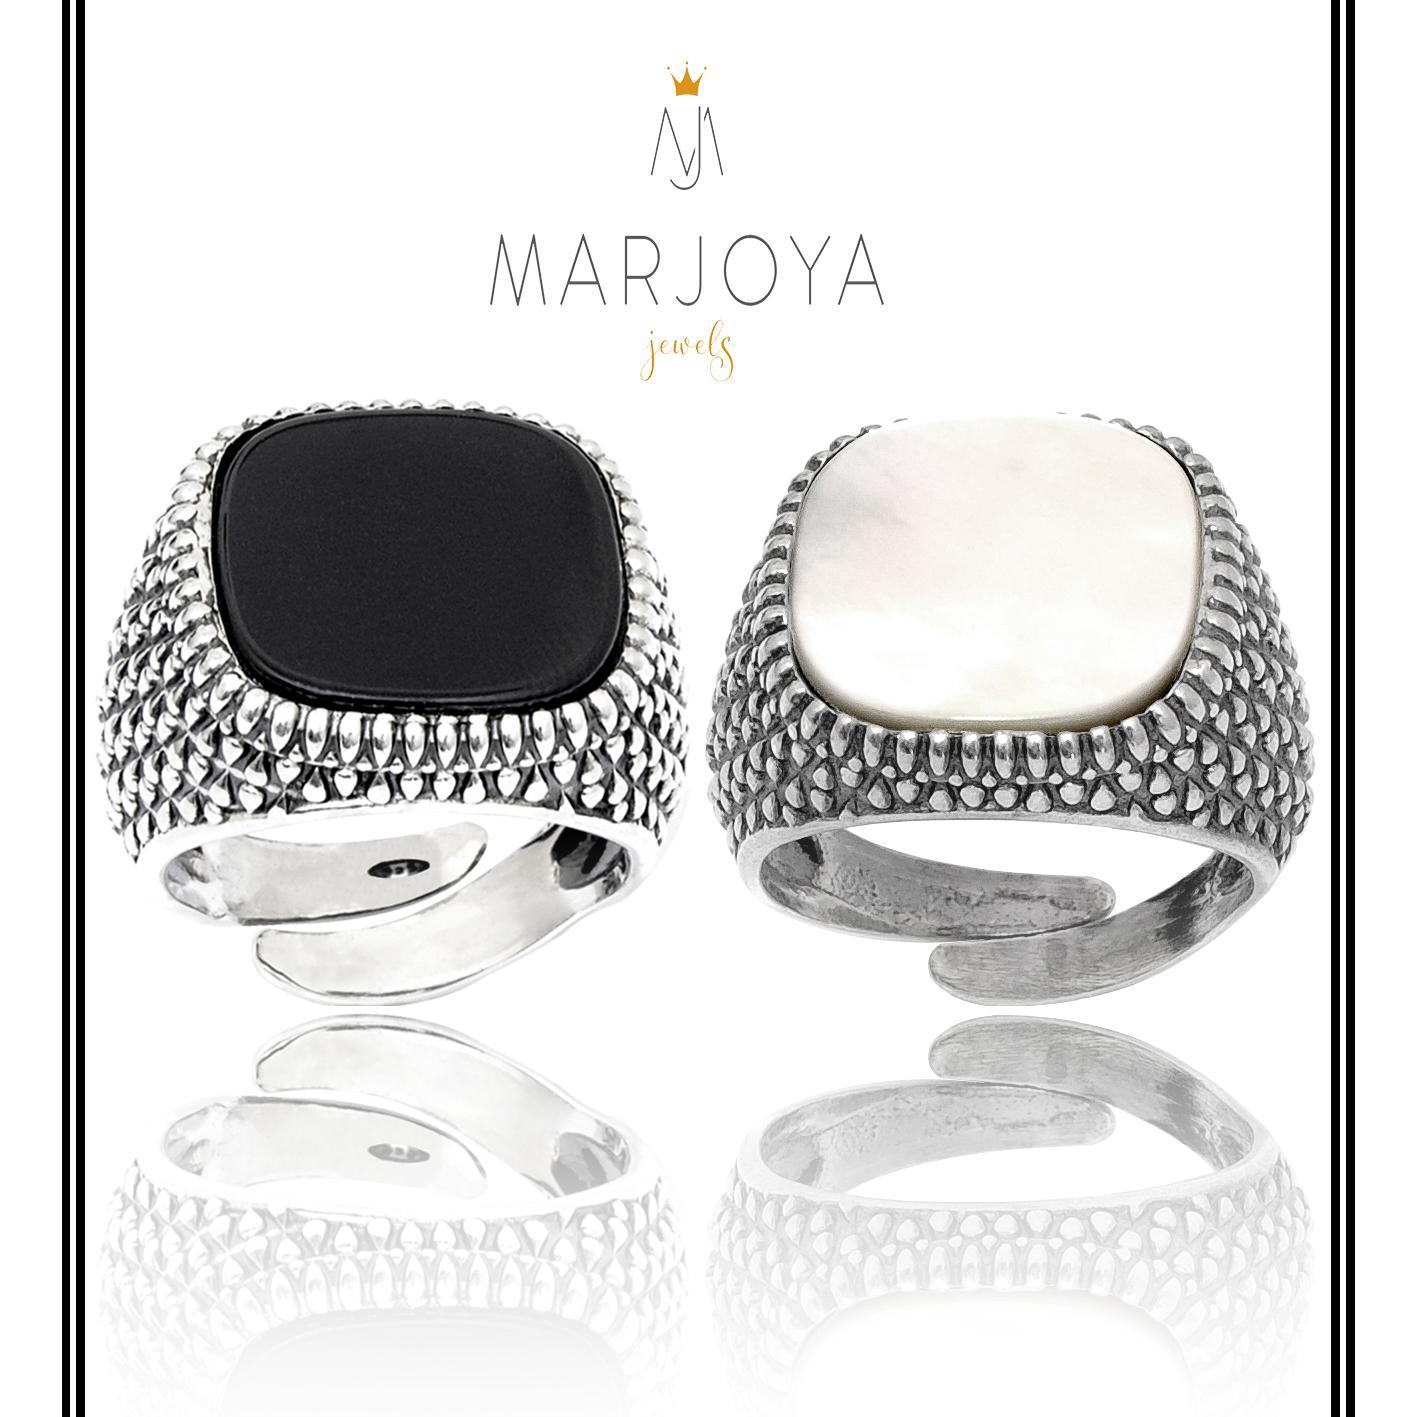 Marjoya_Store